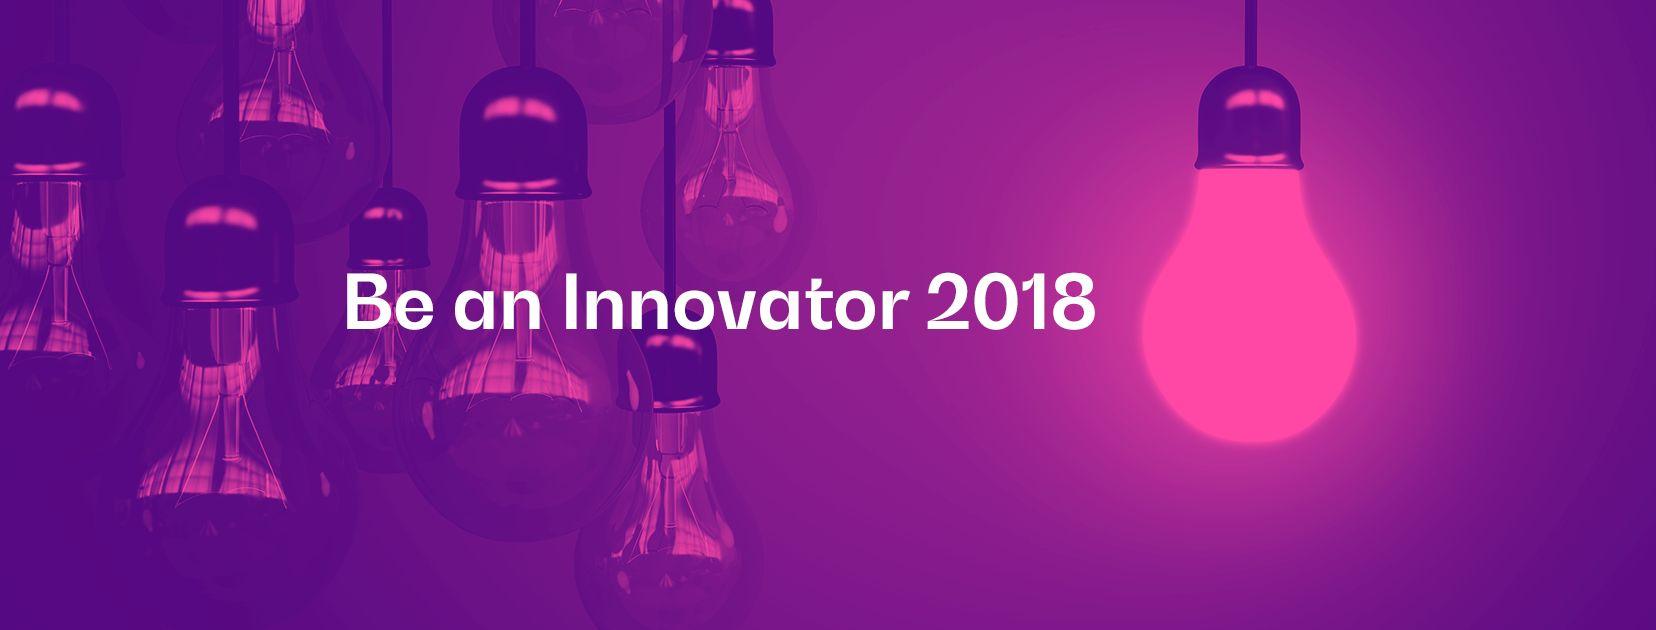 Be an Innovator